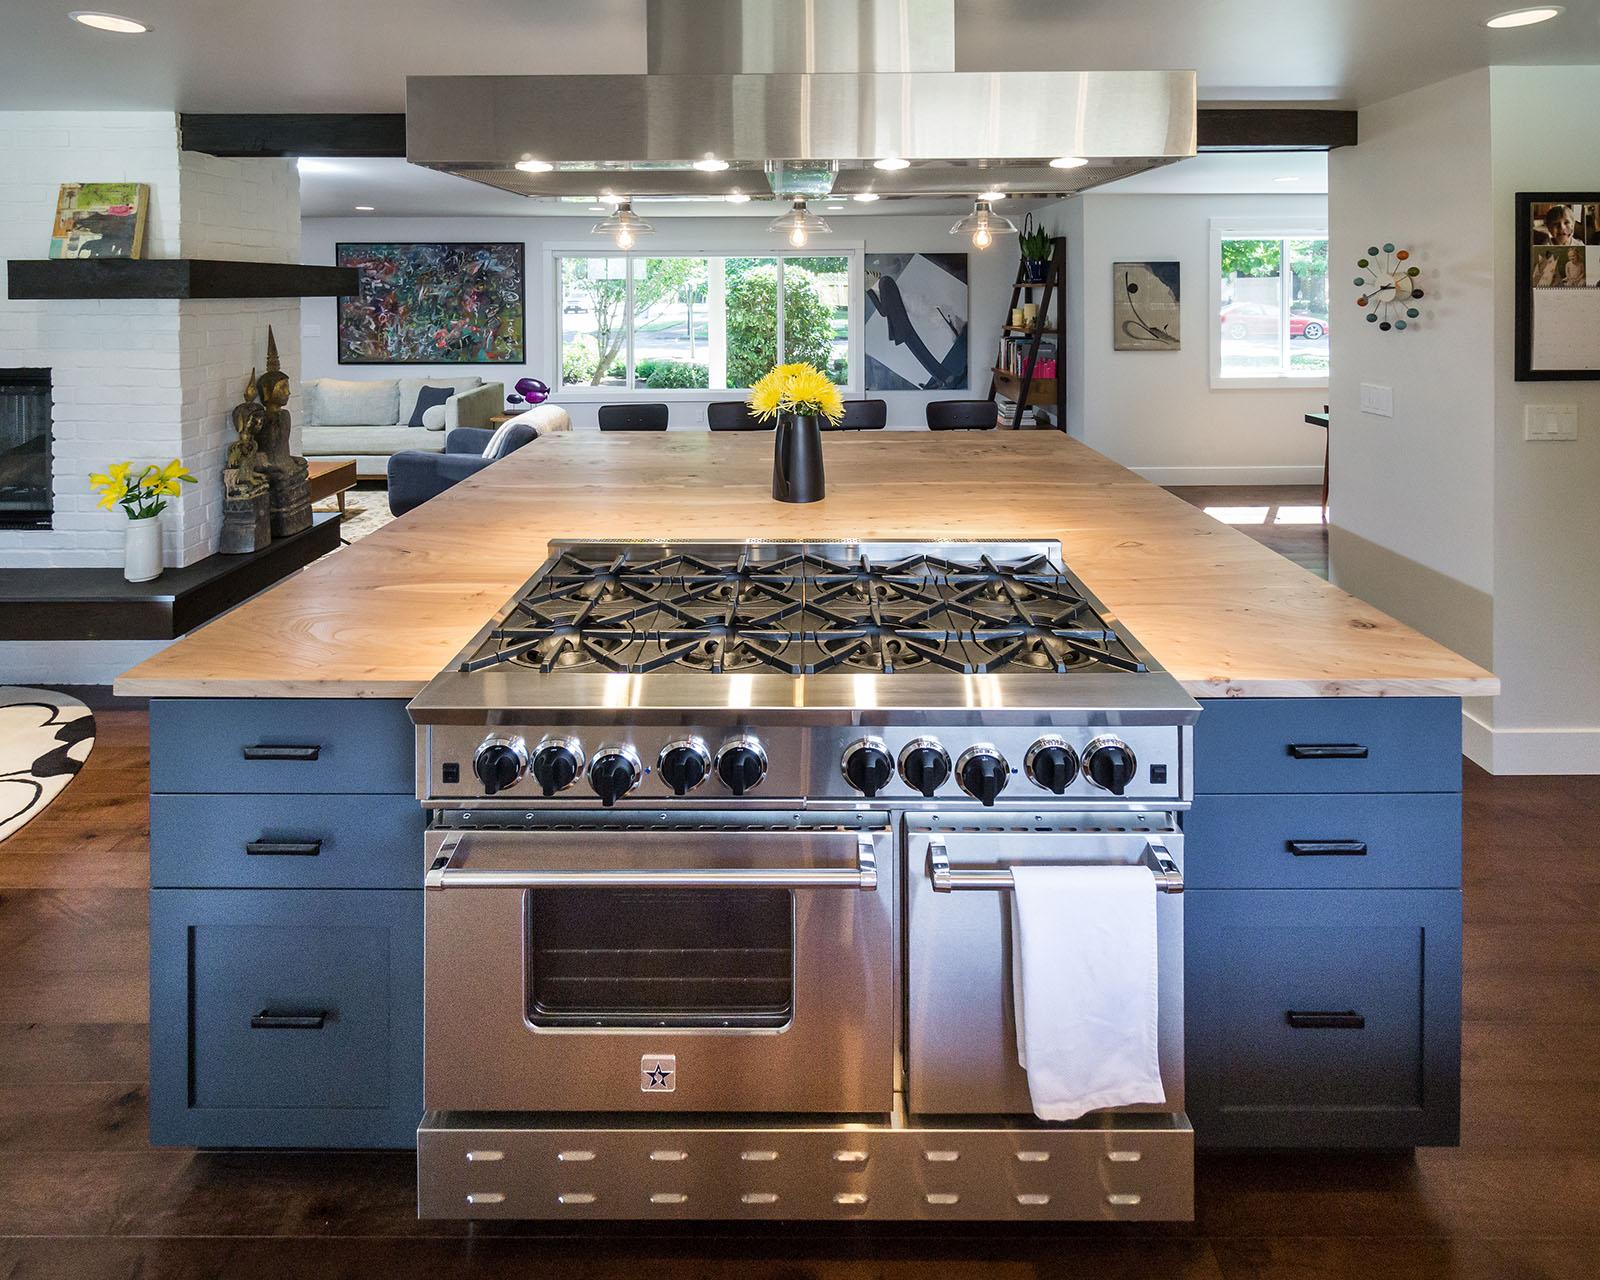 Bluestar announces finalists in 2016 kitchen design competition - Kitchen design competition ...